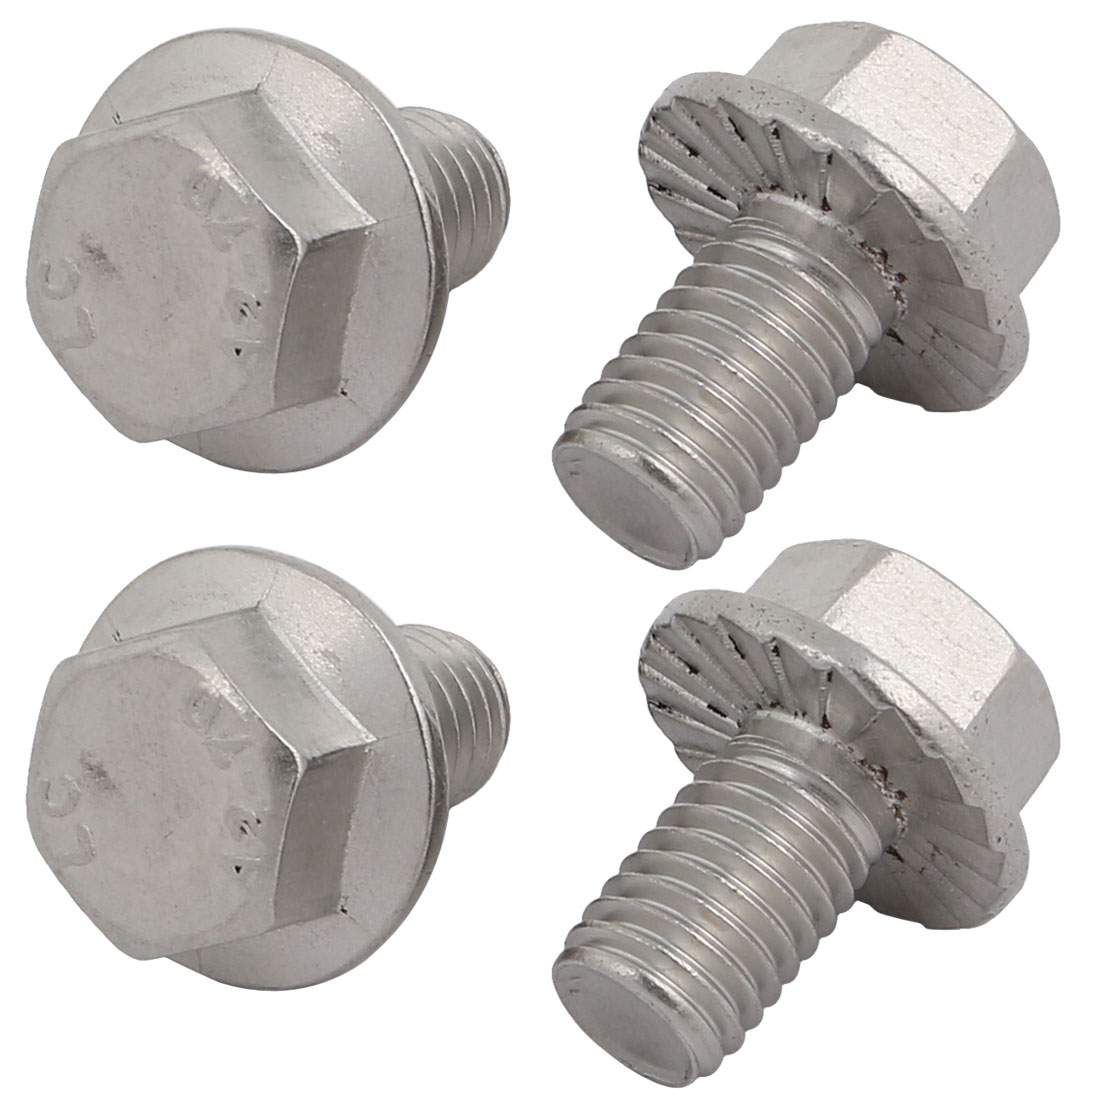 uxcell 2pcs Alloy Steel Hex Socket Drive M12x150mm Shoulder Screw M10x18mm Thread